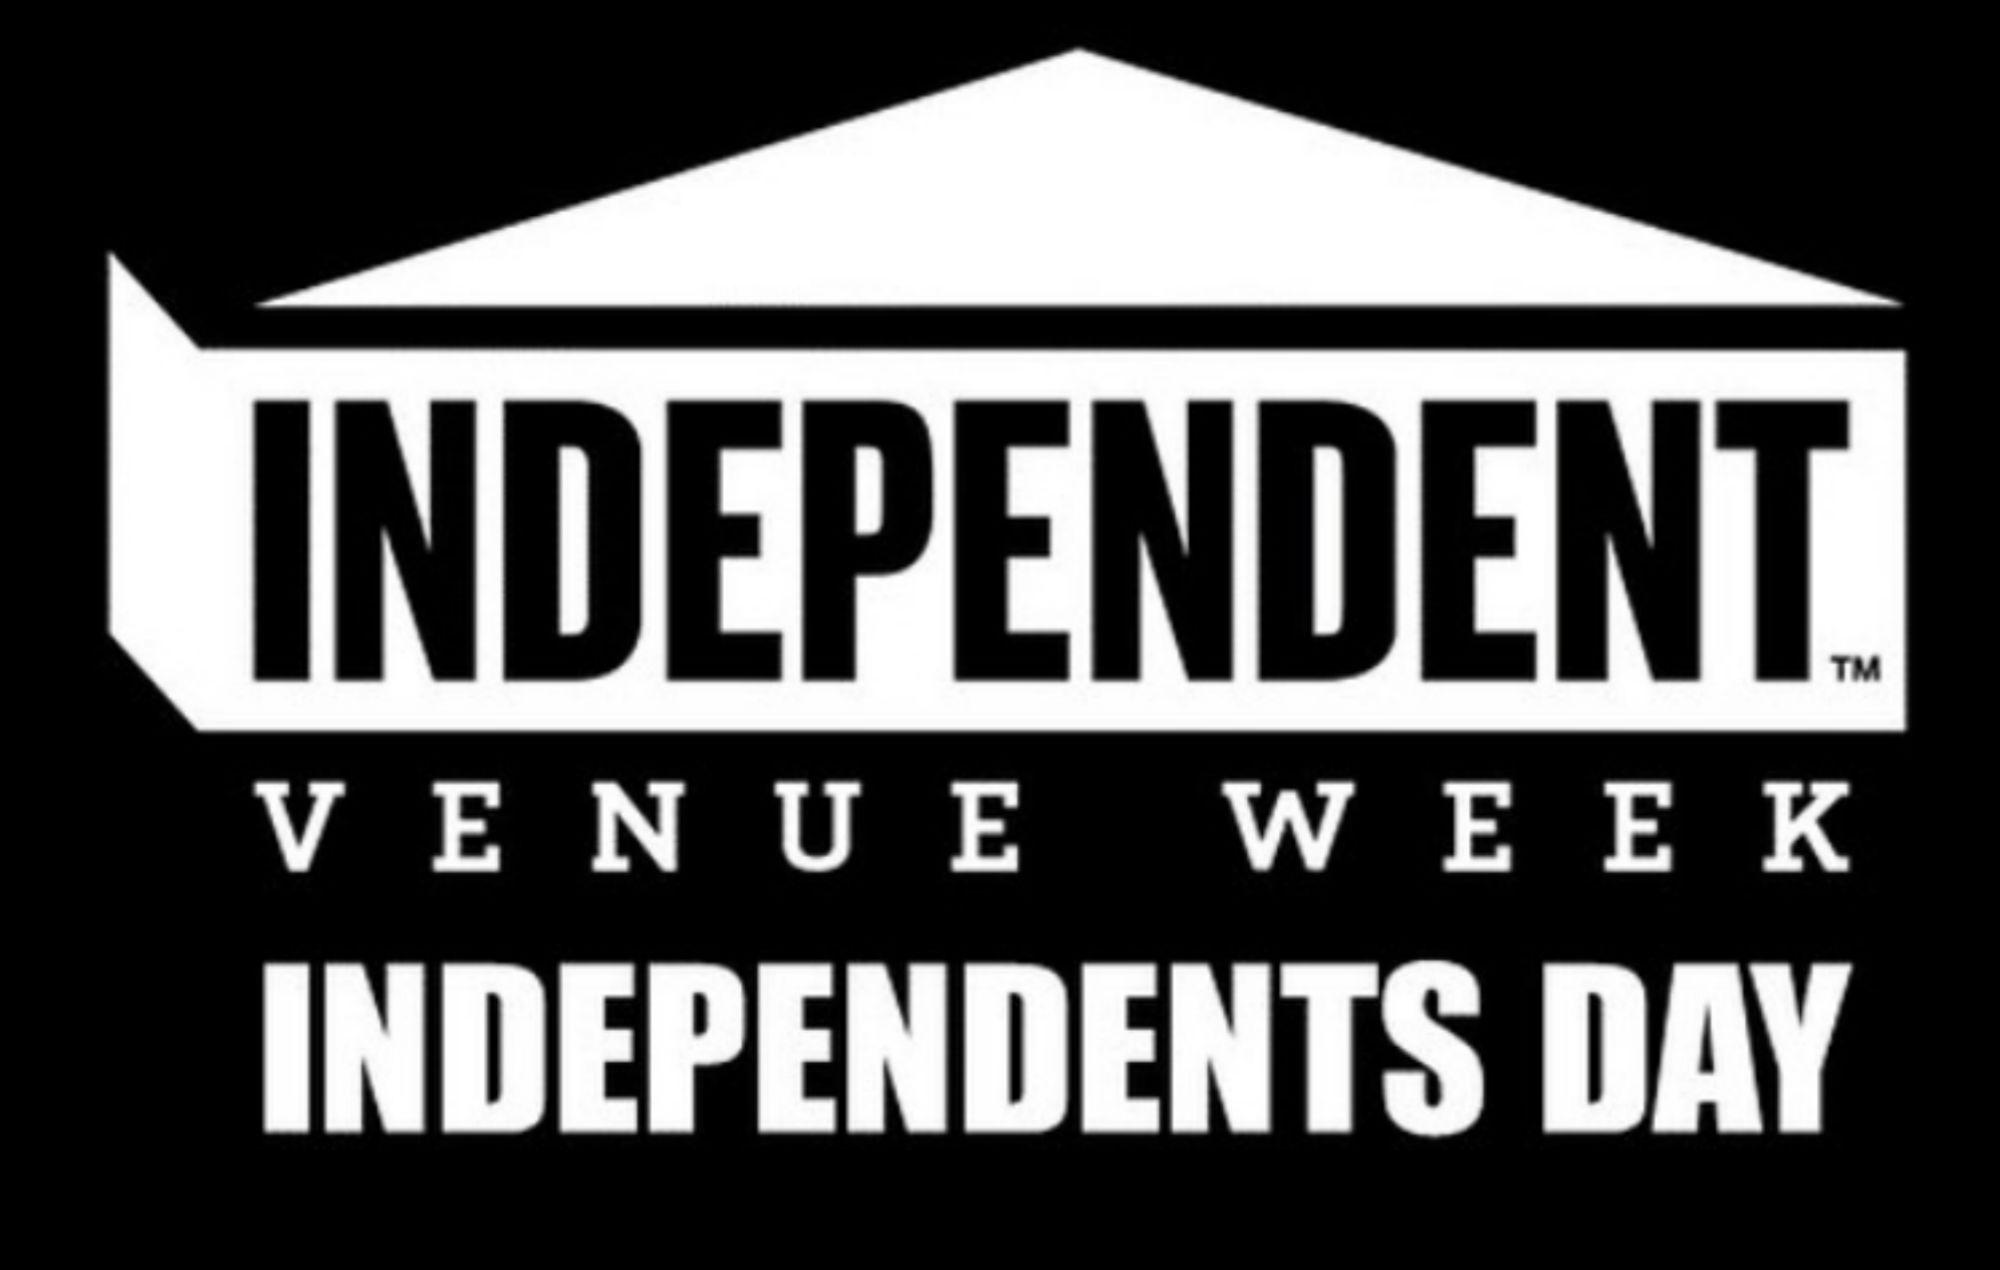 Independent Venue Week's Independent's Day